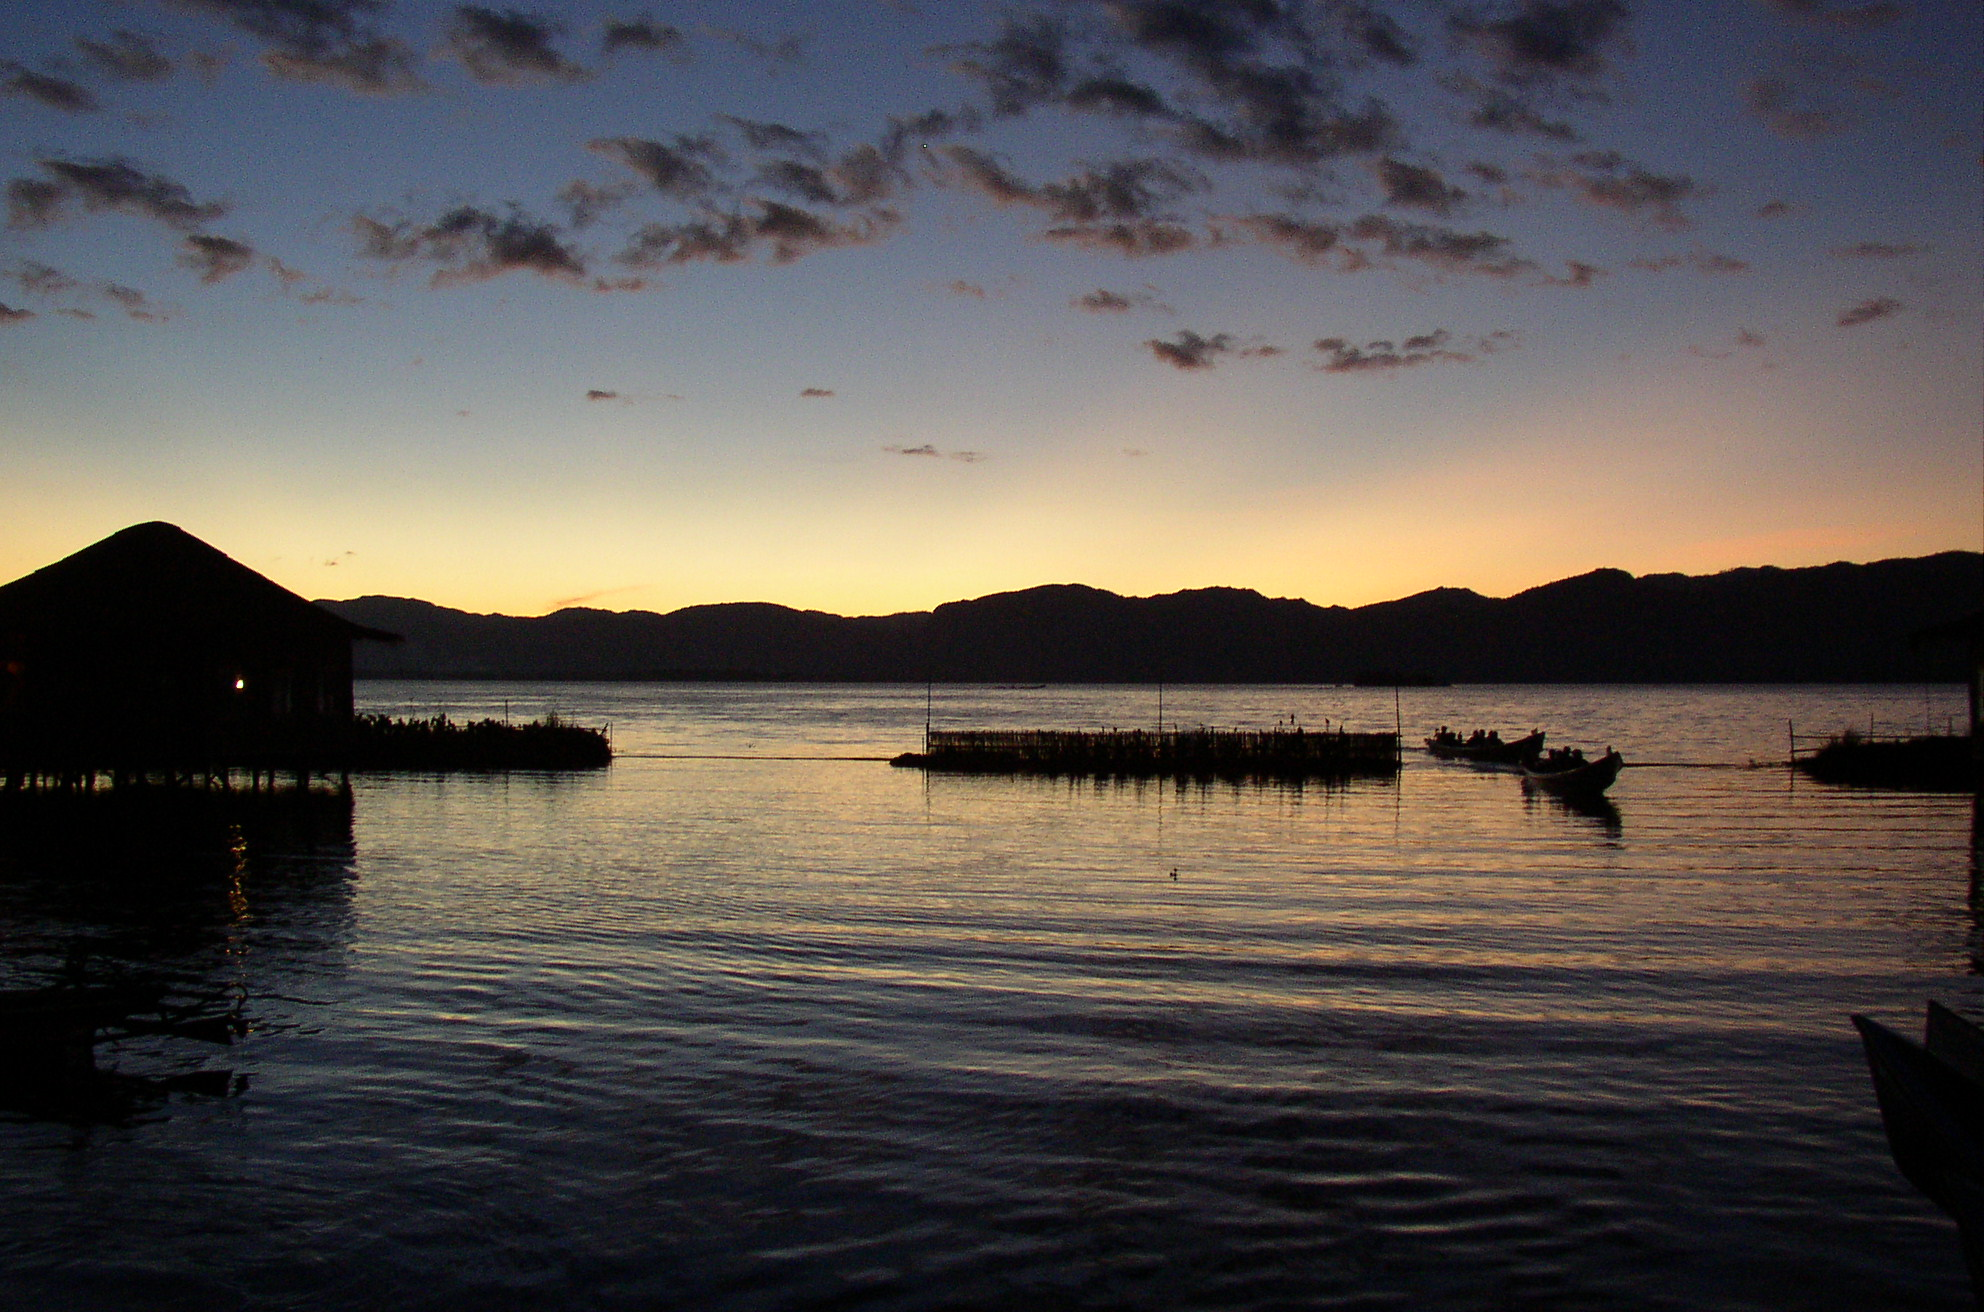 File:Inle Lake, evening.JPG - Wikipedia